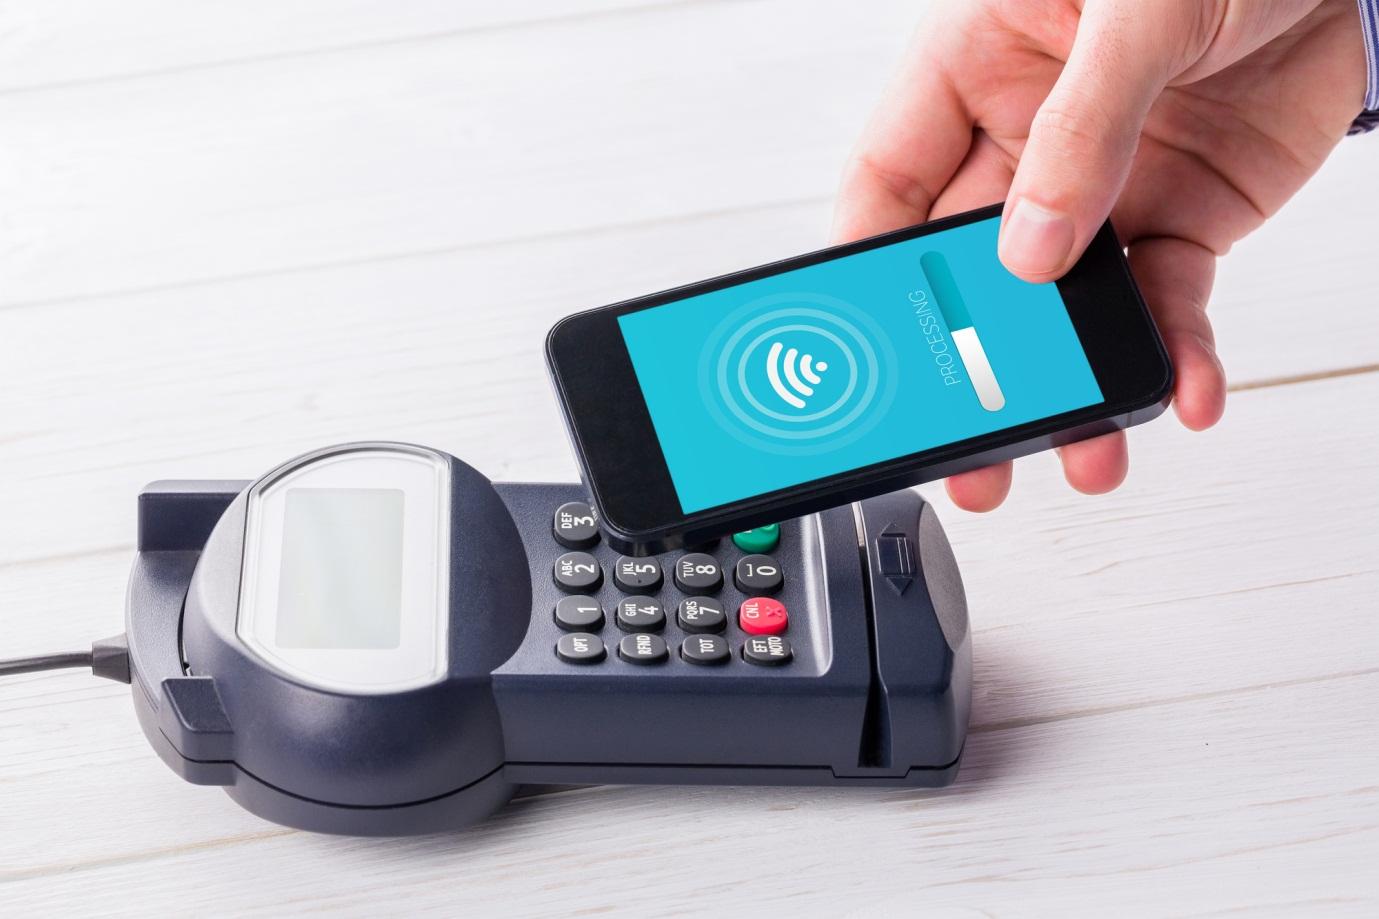 Технология nfc в смартфонах заменяет банковскую карту